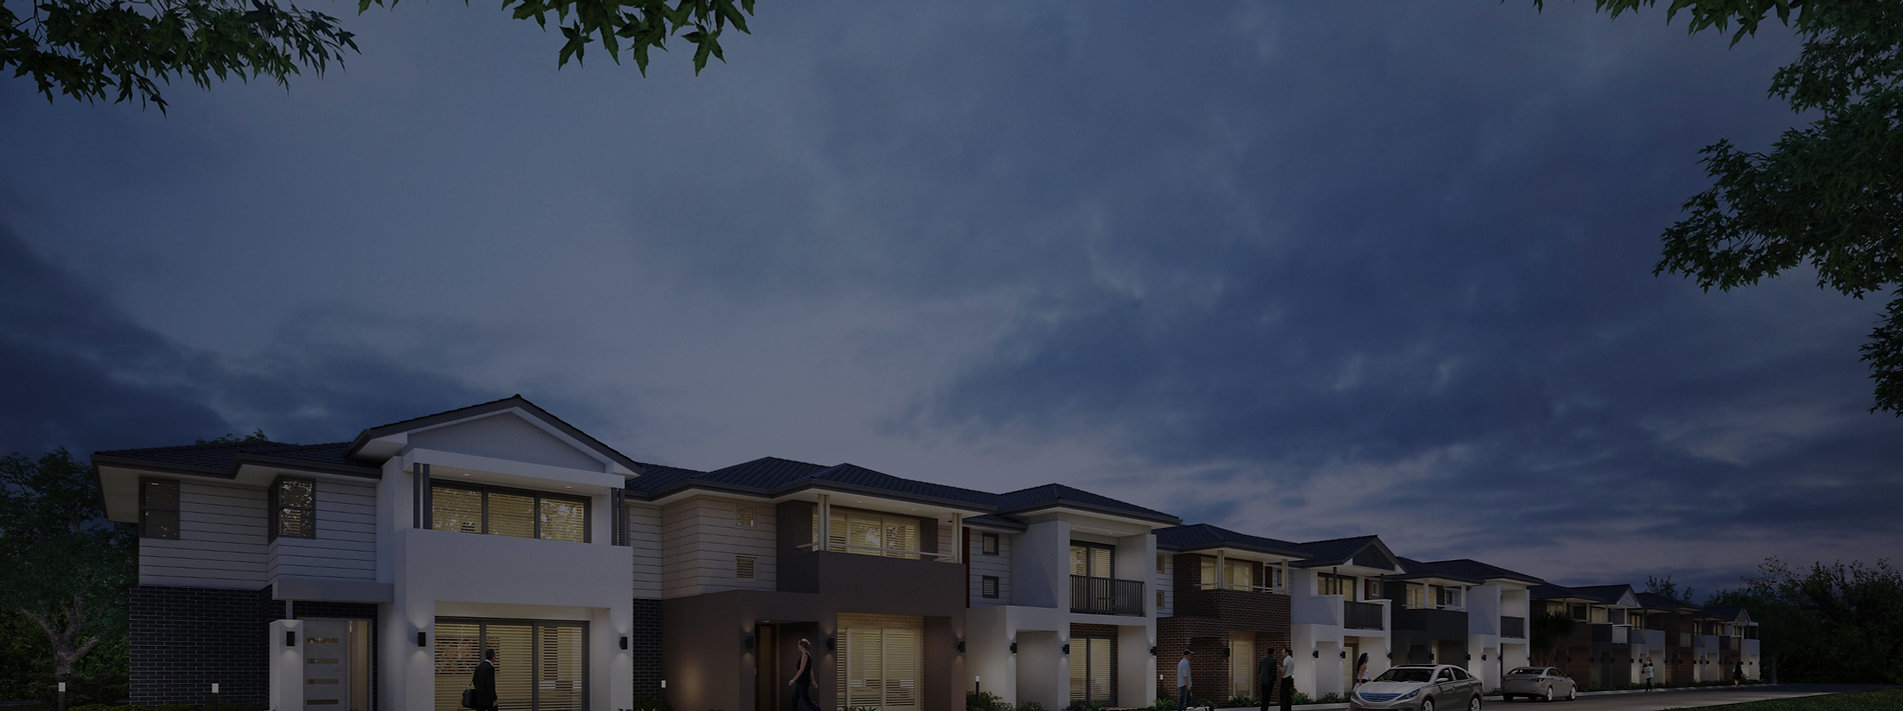 Terraces%20master%20image%20130901%20Lot